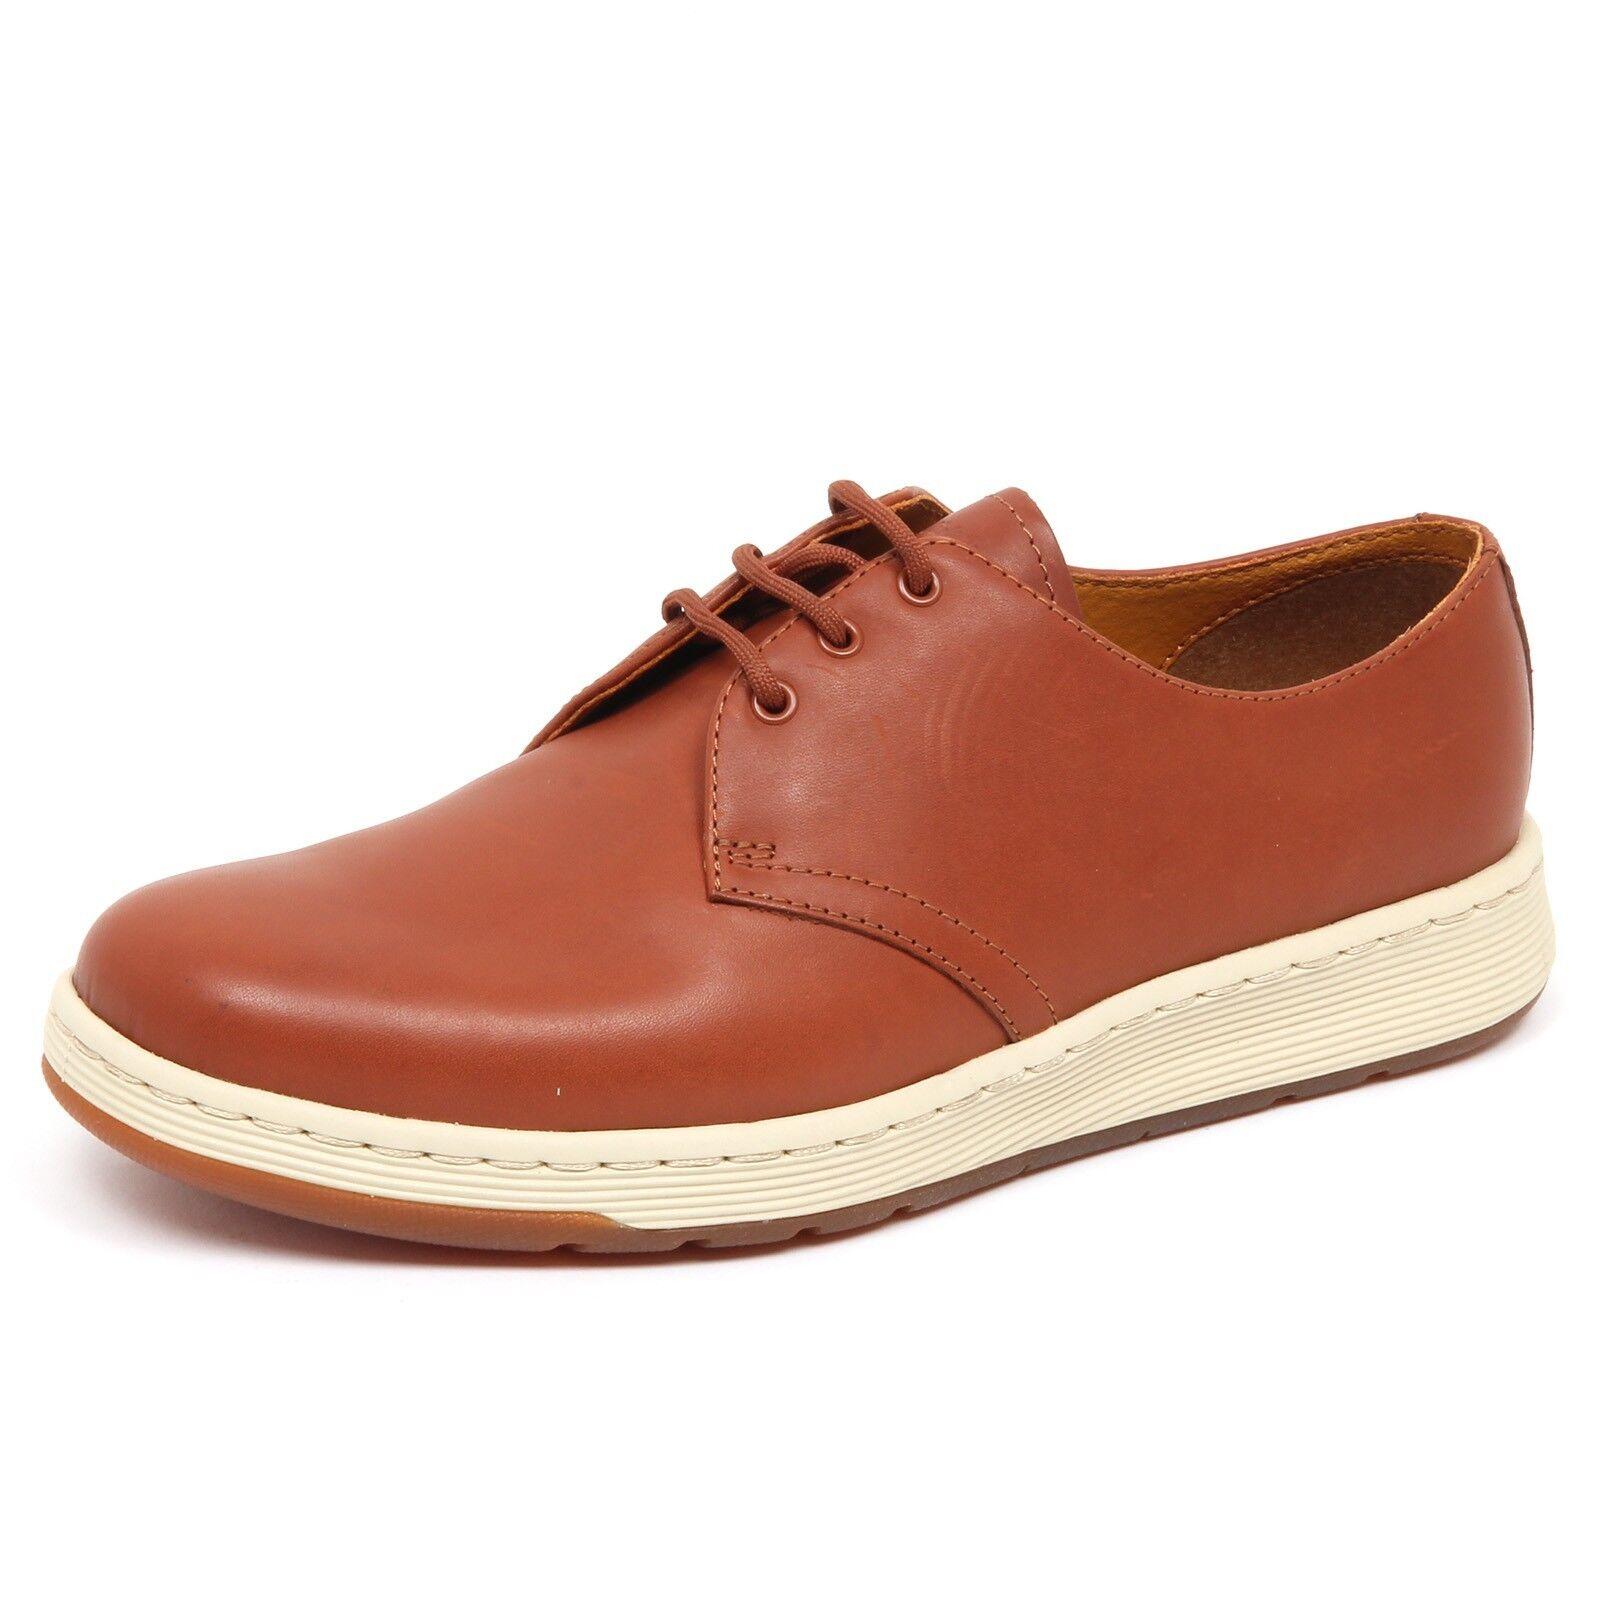 D8068 (without box) scarpa uomo uomo uomo cuoio DR. MARTENS shoe man 9a5a3a